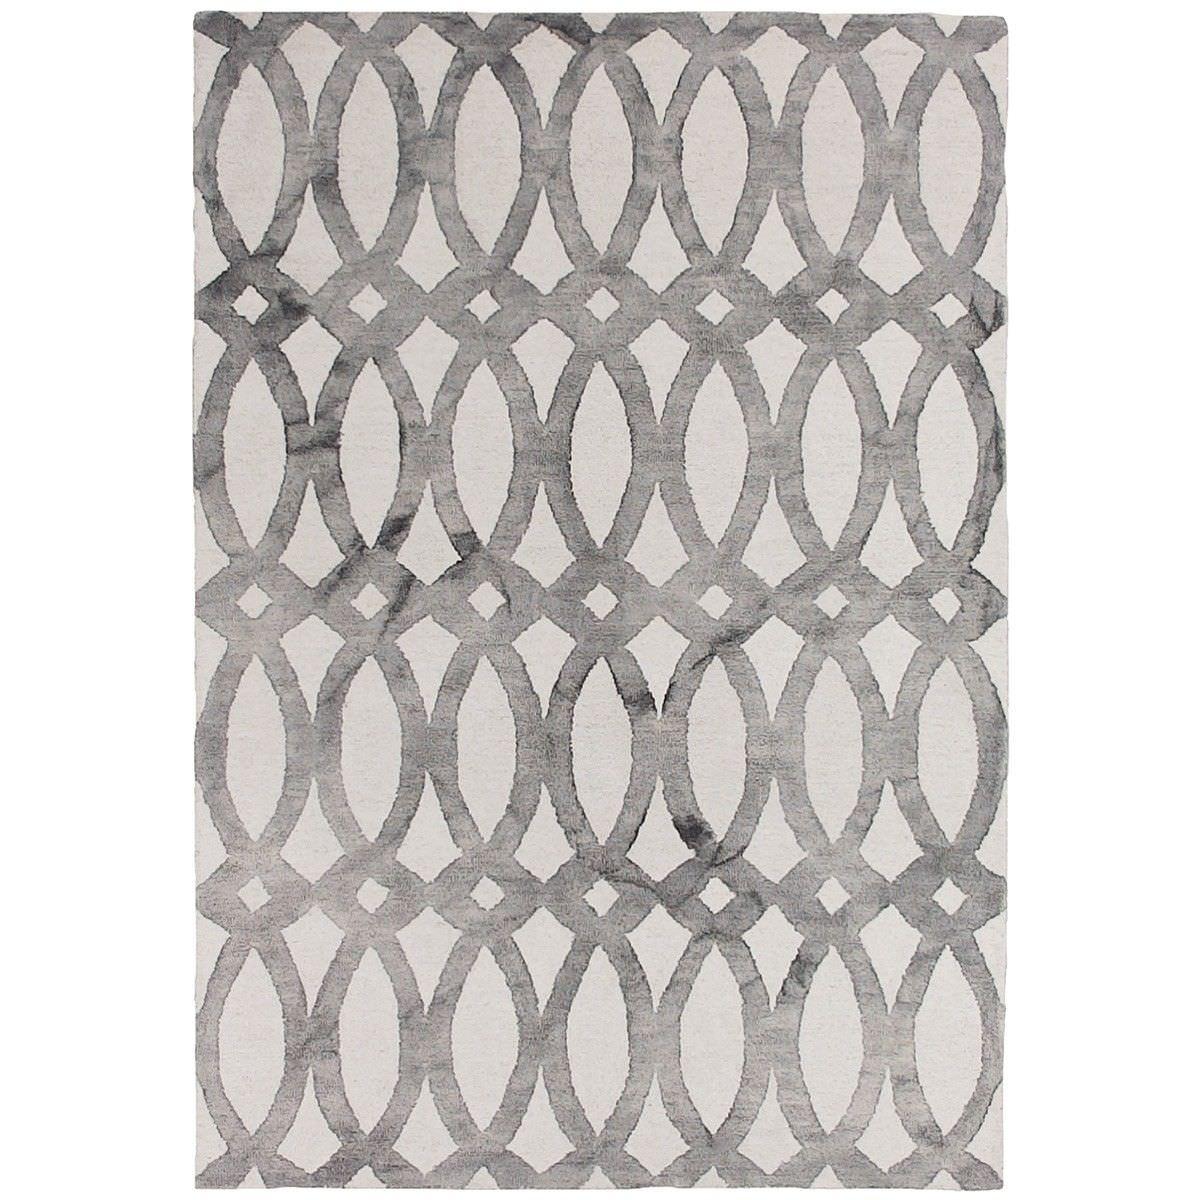 Dip Dye Hand Tufted Wool Rug, 160x230cm, Grey